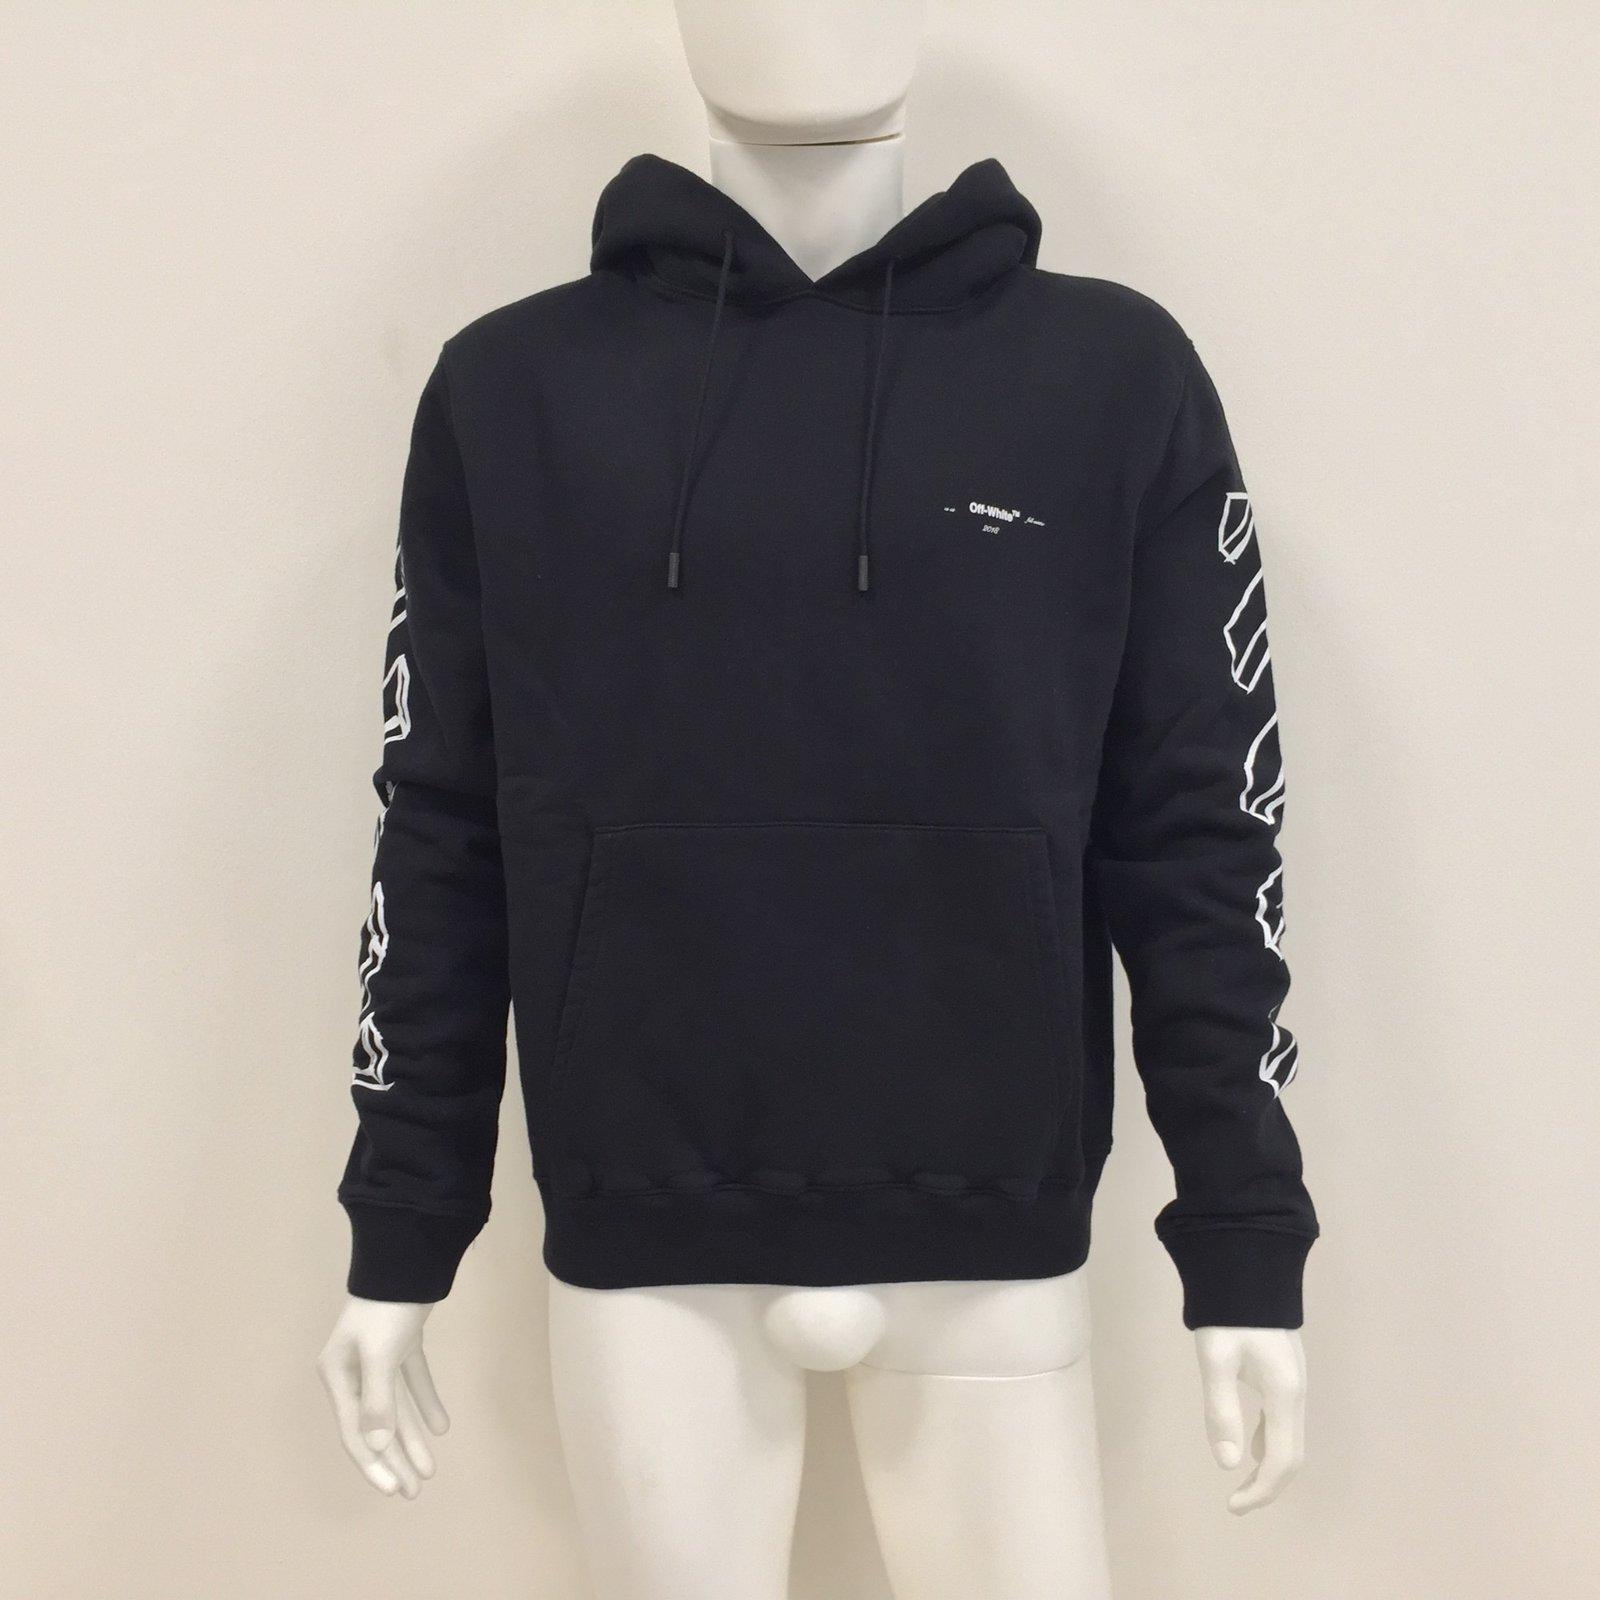 Off White Sweaters Sweaters Cotton Black ref.76274 - Joli Closet a4eec5003